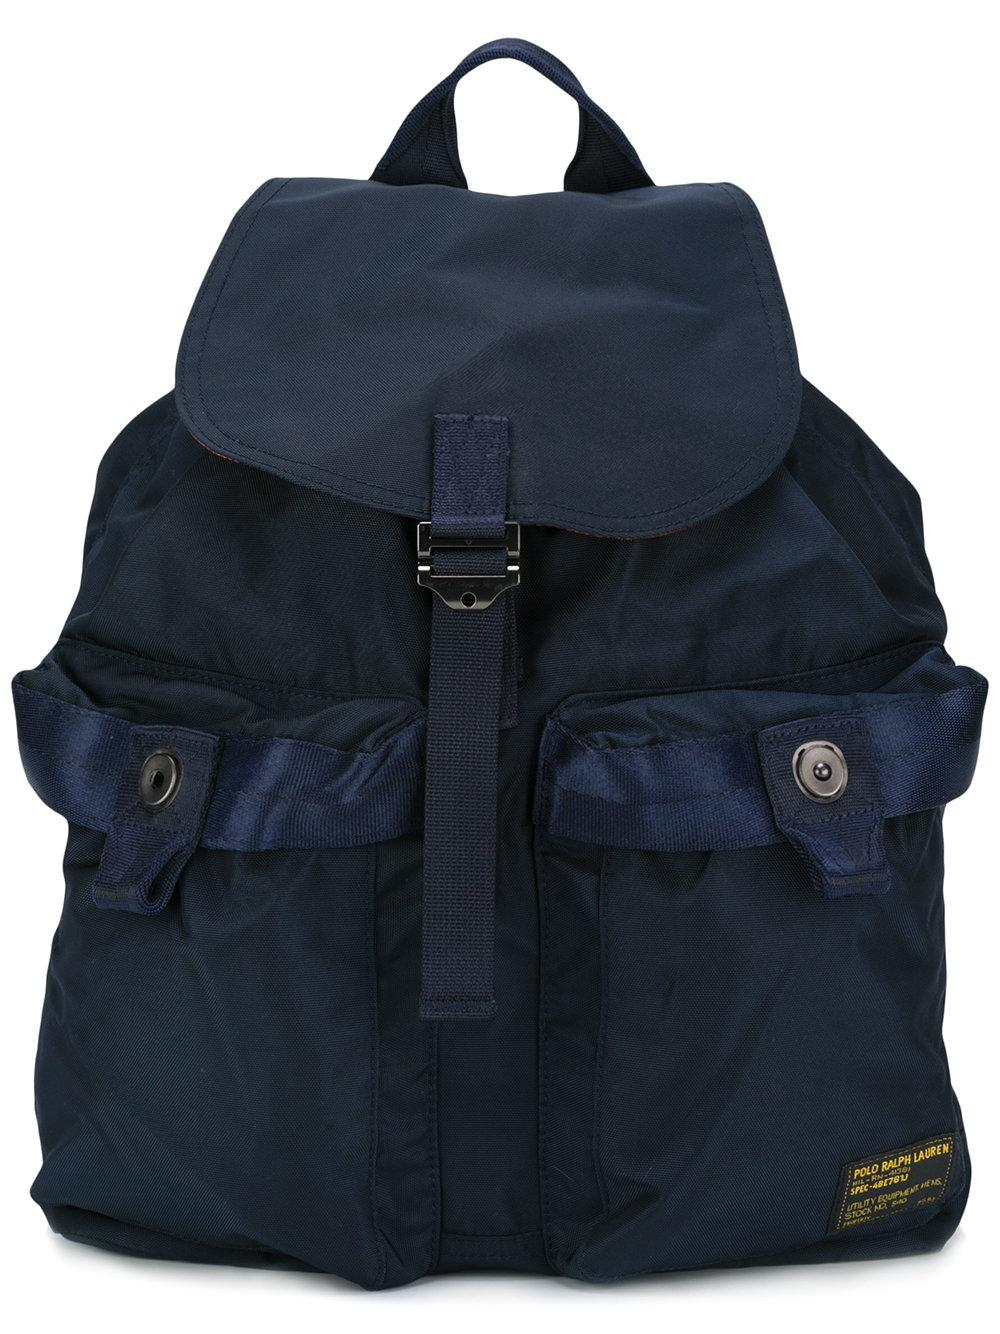 3d31e00abb42 Lyst - Polo ralph lauren Buckled Backpack in Blue for Men